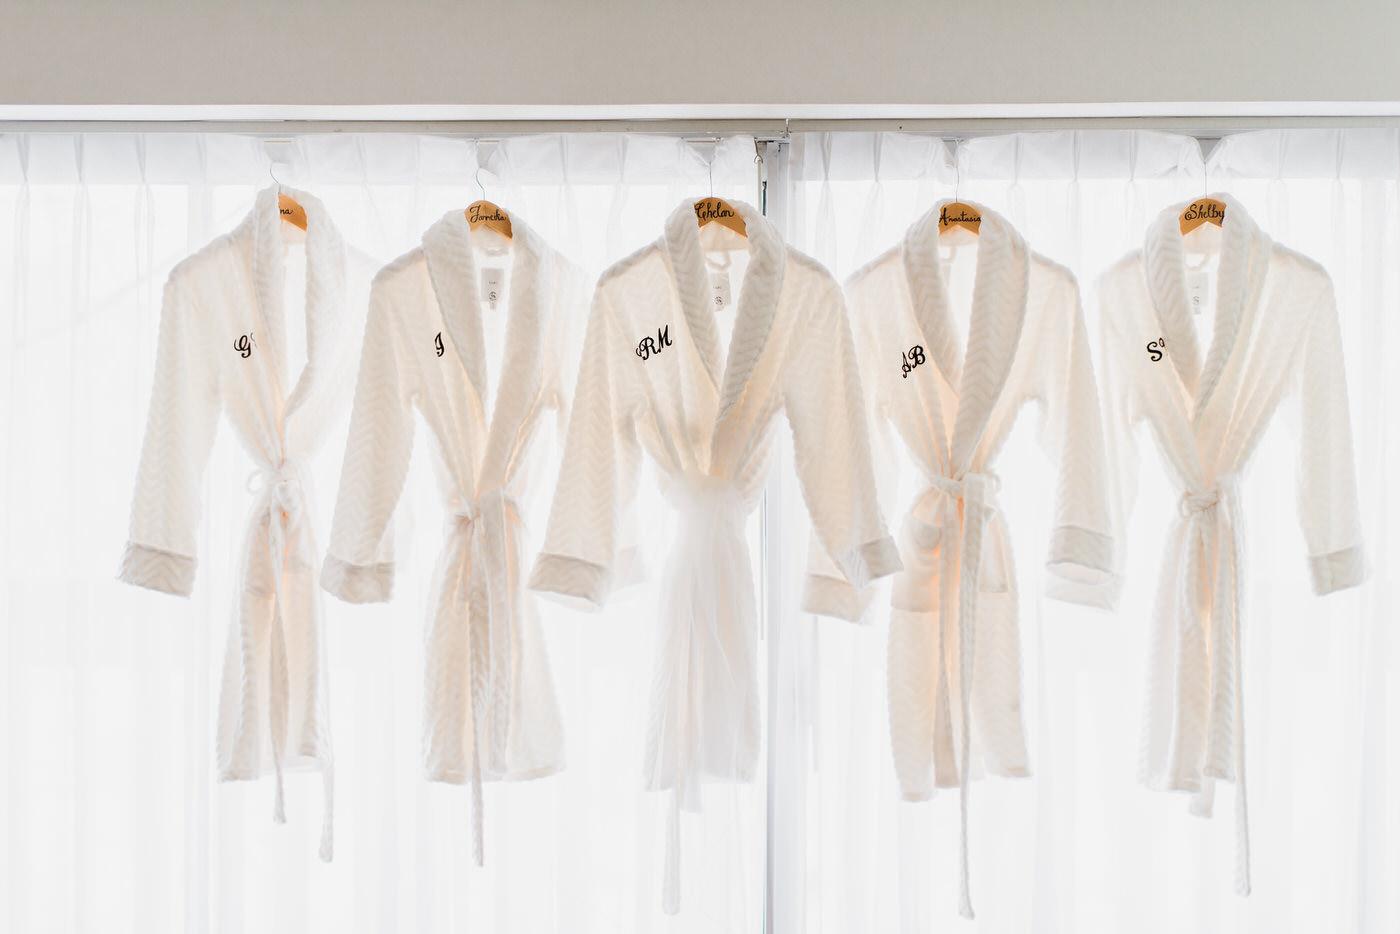 bridesmaids dresses hanging on frame